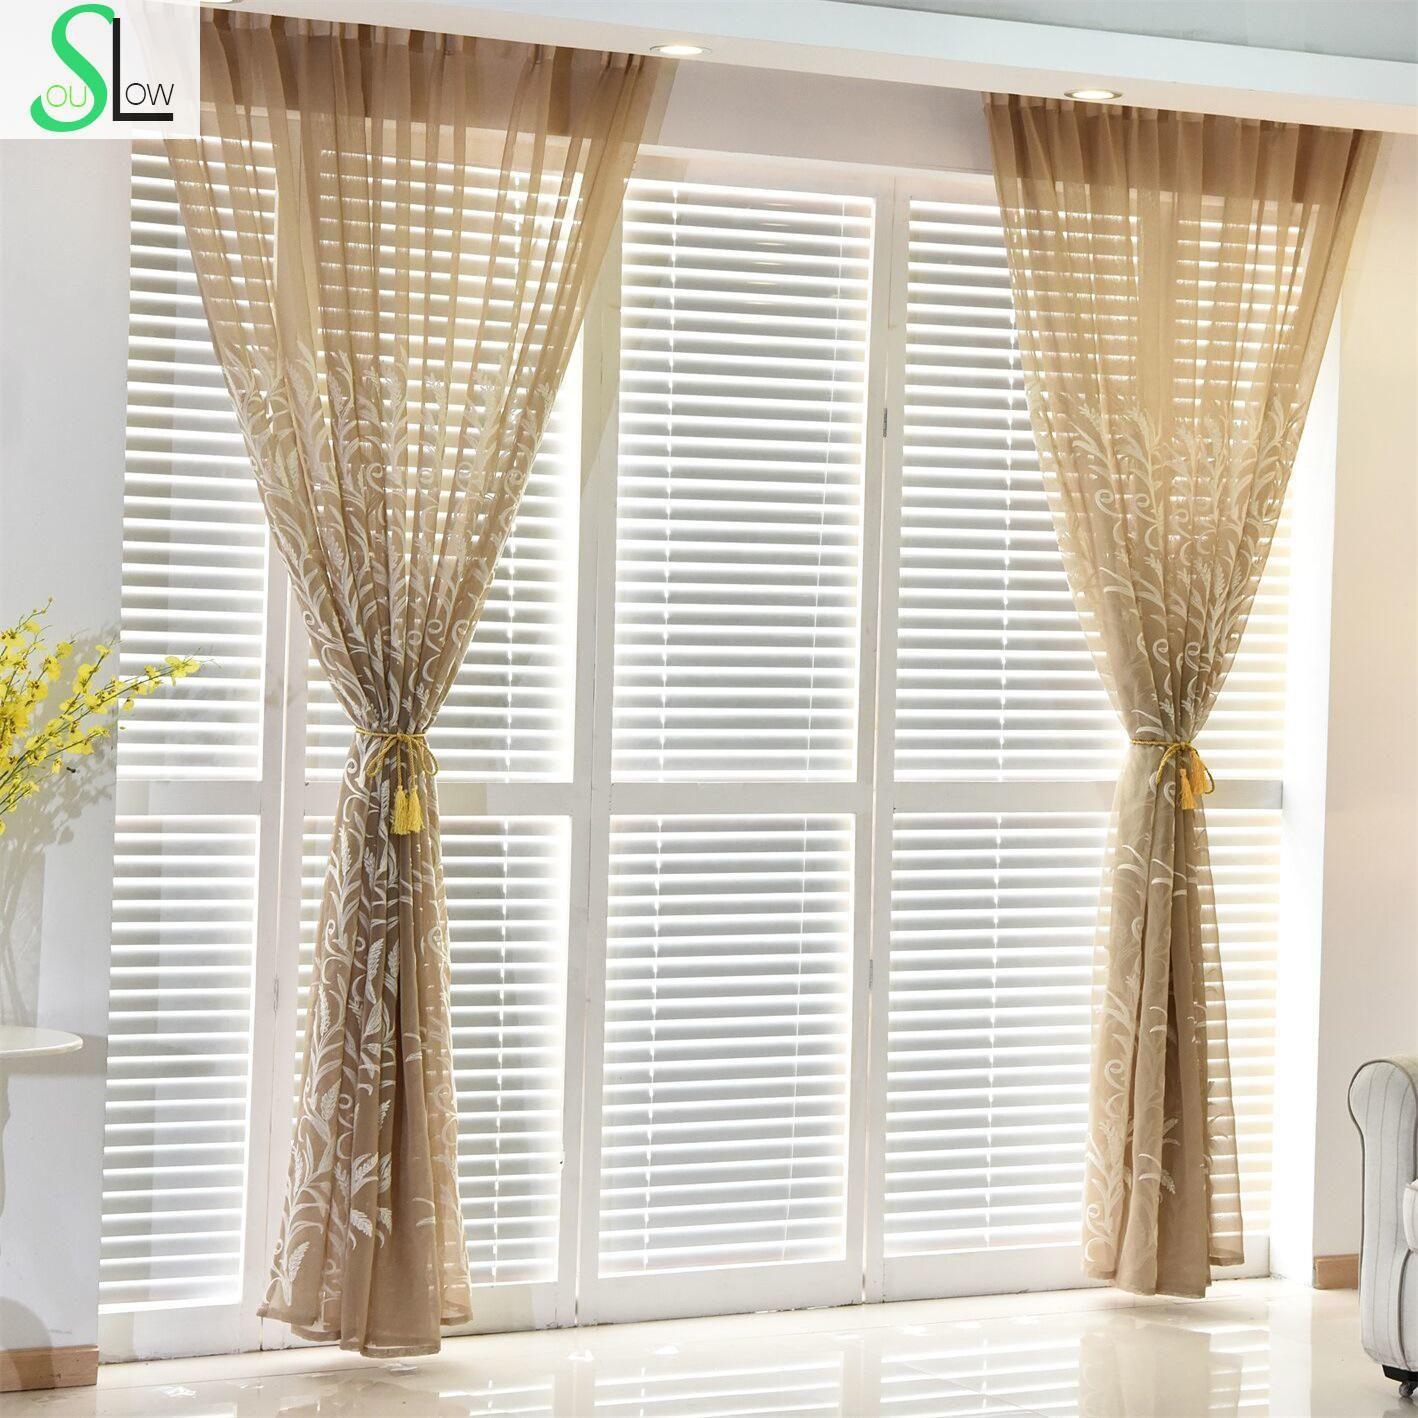 Slow soul white blue light brown modern cotton curtain living room